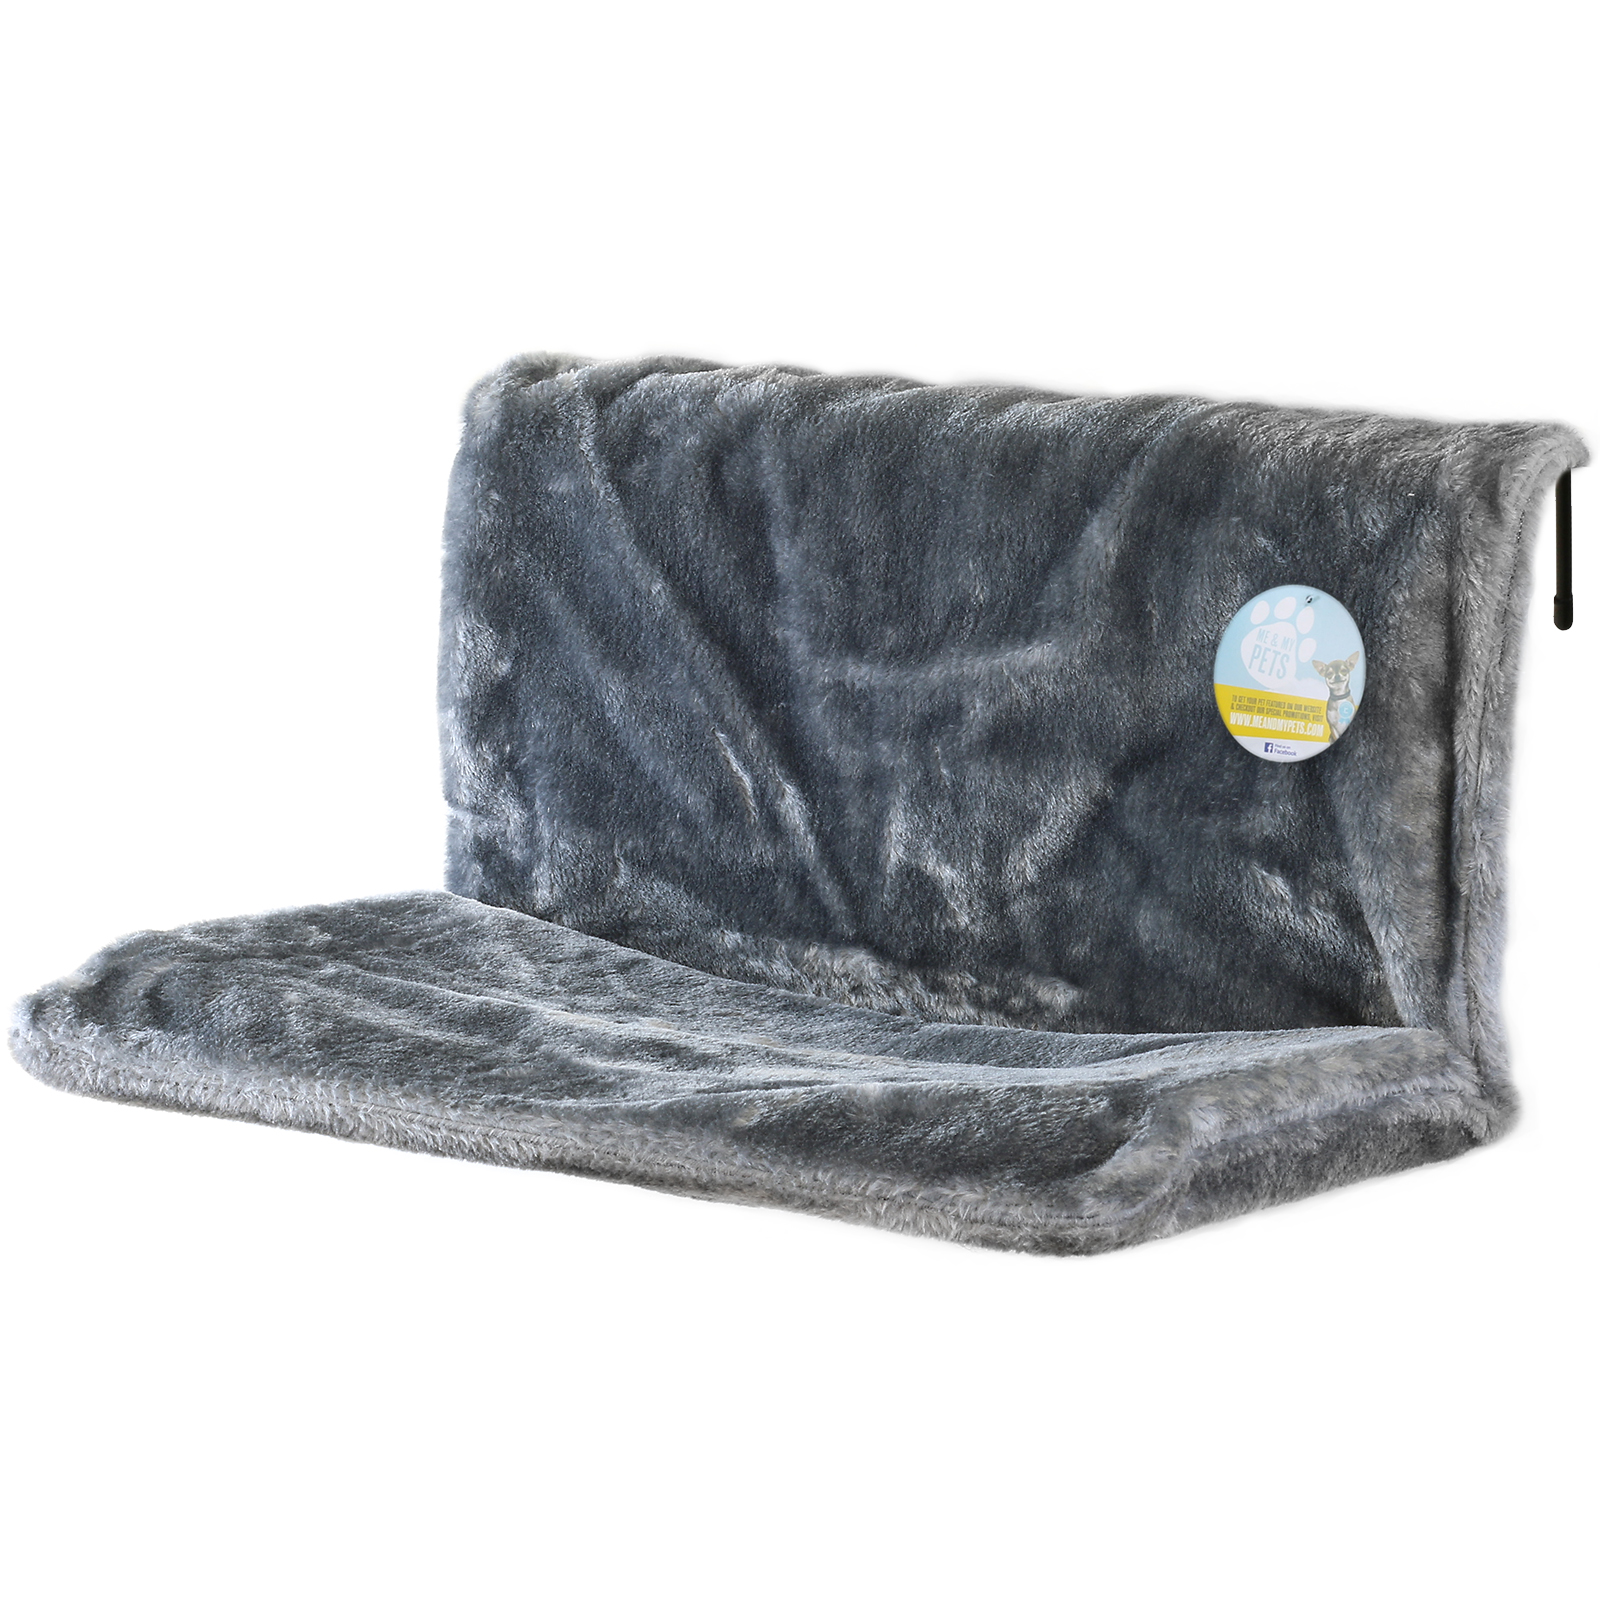 Me Amp My Grey Cat Radiator Snug Bed Warm Fleece Basket